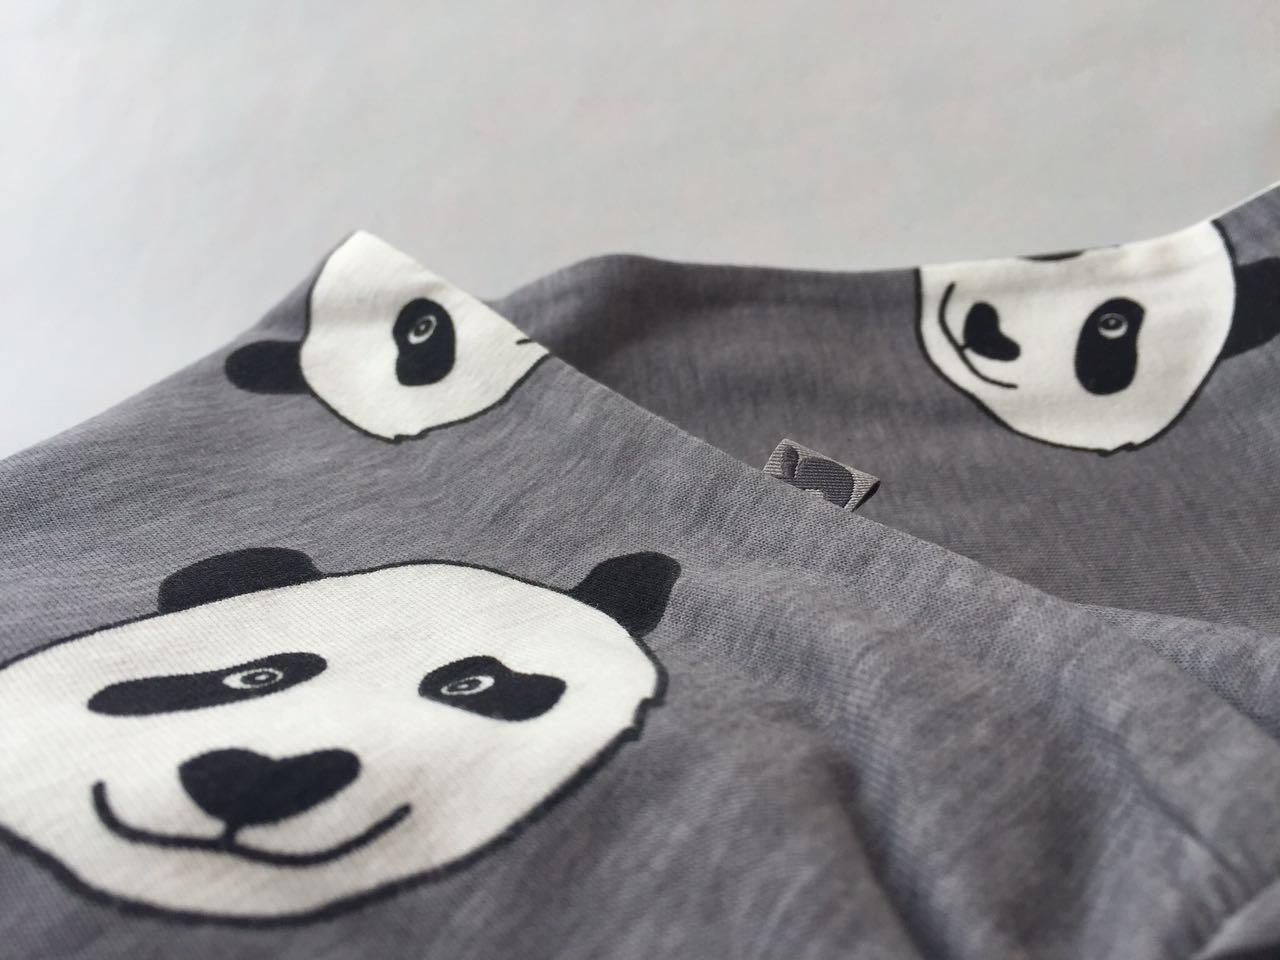 SMAFOLK Kinder Hose Pants Panda Gesicht Wilde Dove - 3